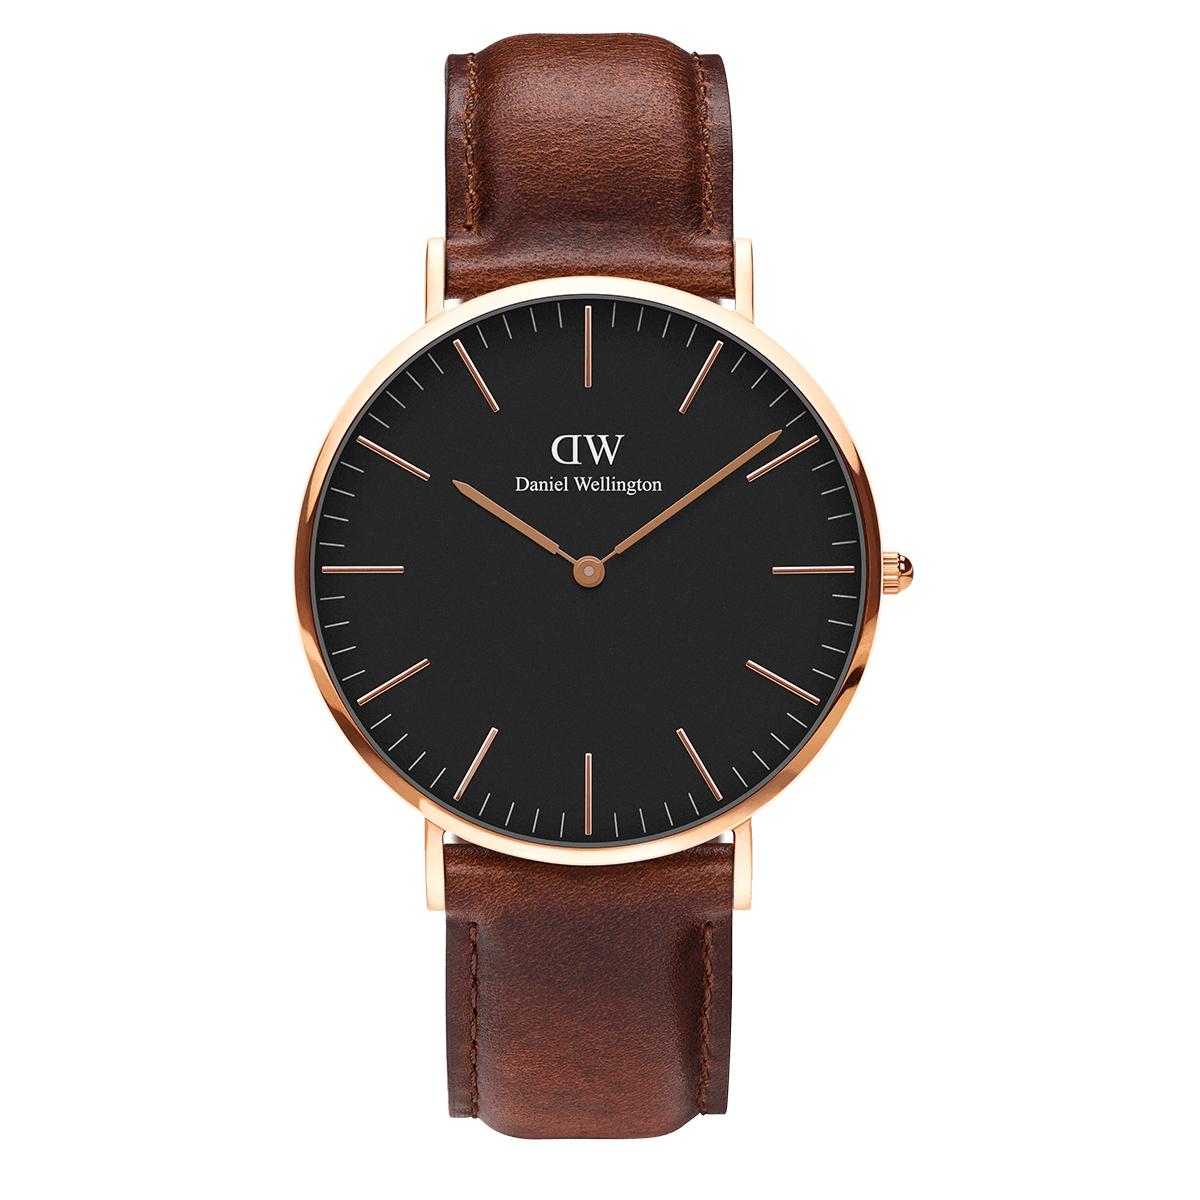 Daniel Wellington ST MAWES - Reloj marrón